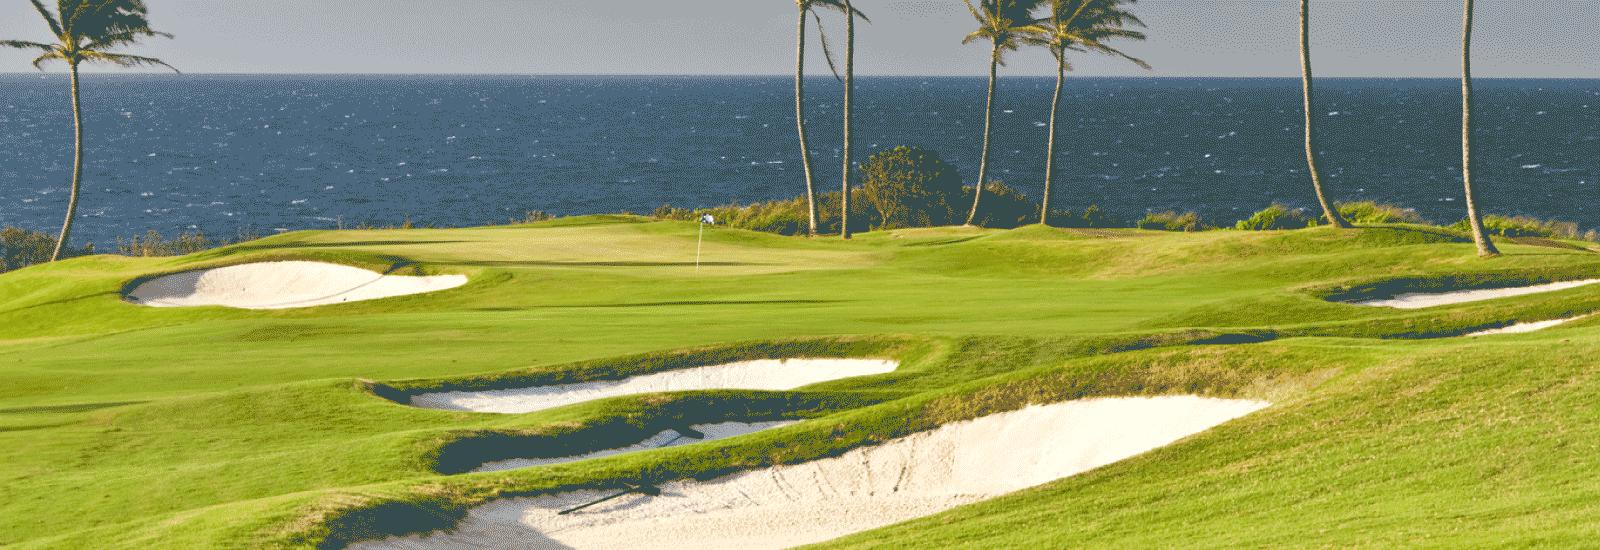 Schofield Barracks Golf Courses